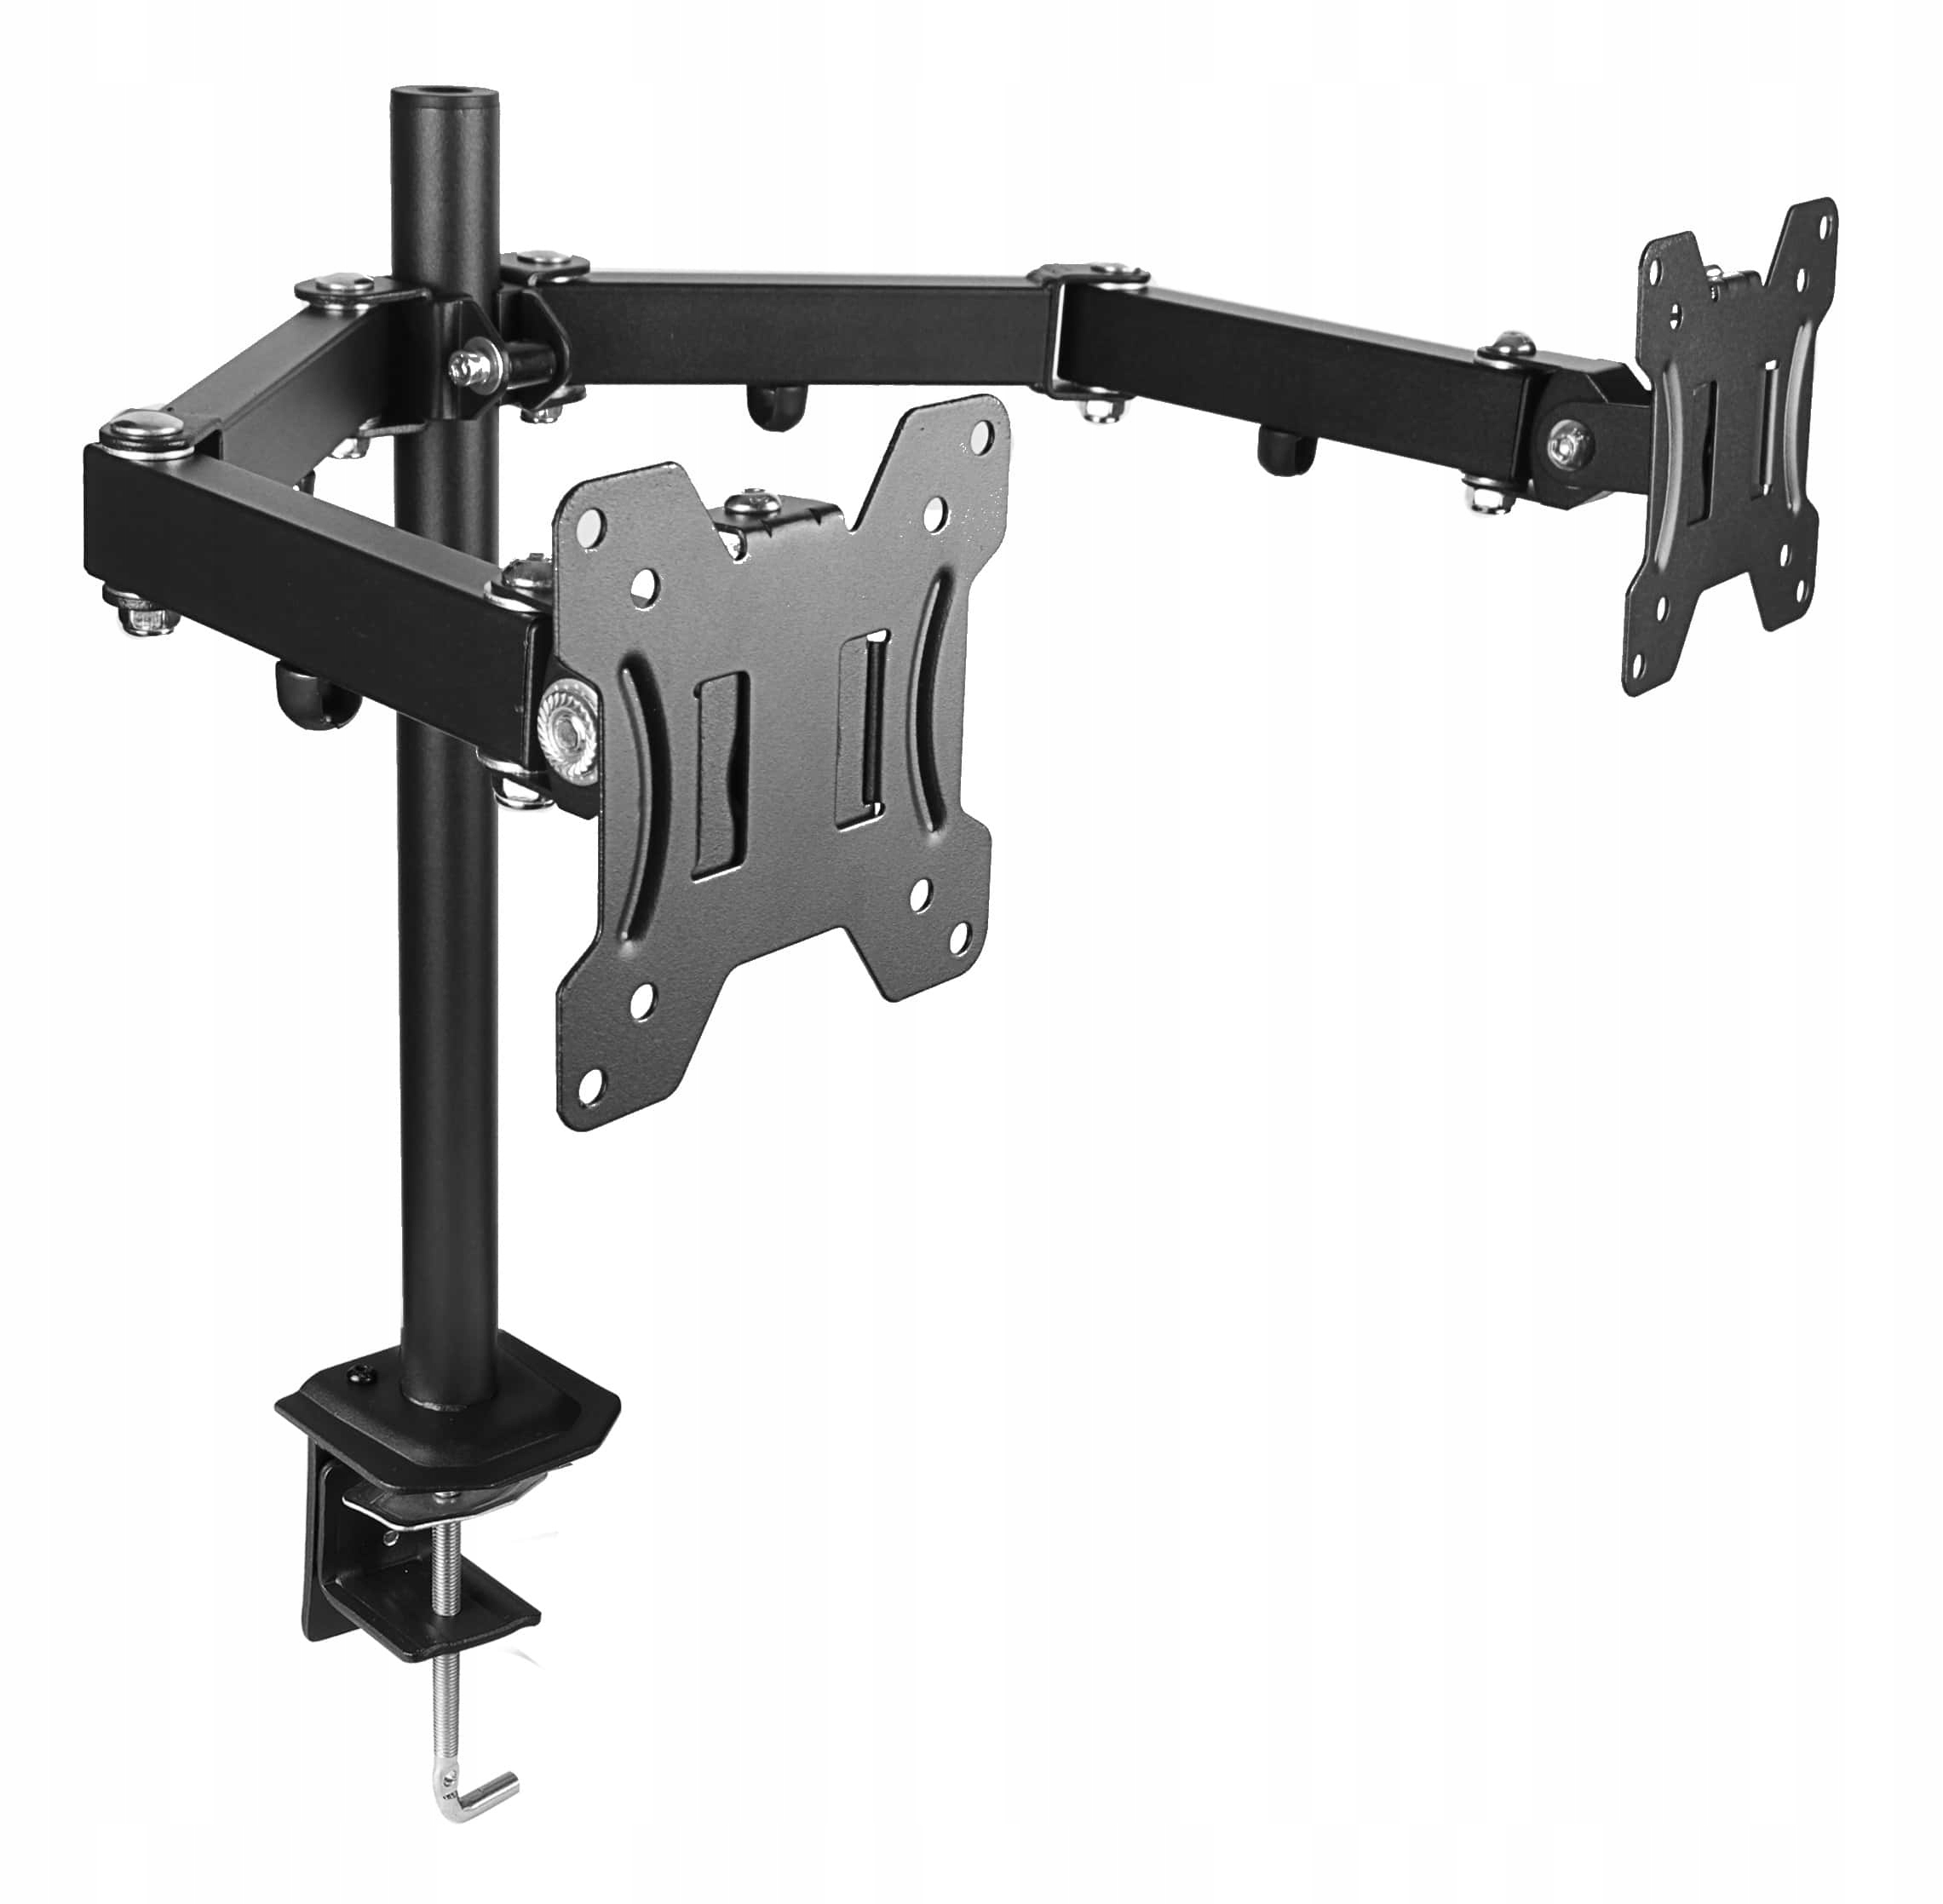 Item DESKTOP SWIVEL mount for two monitors 10-27